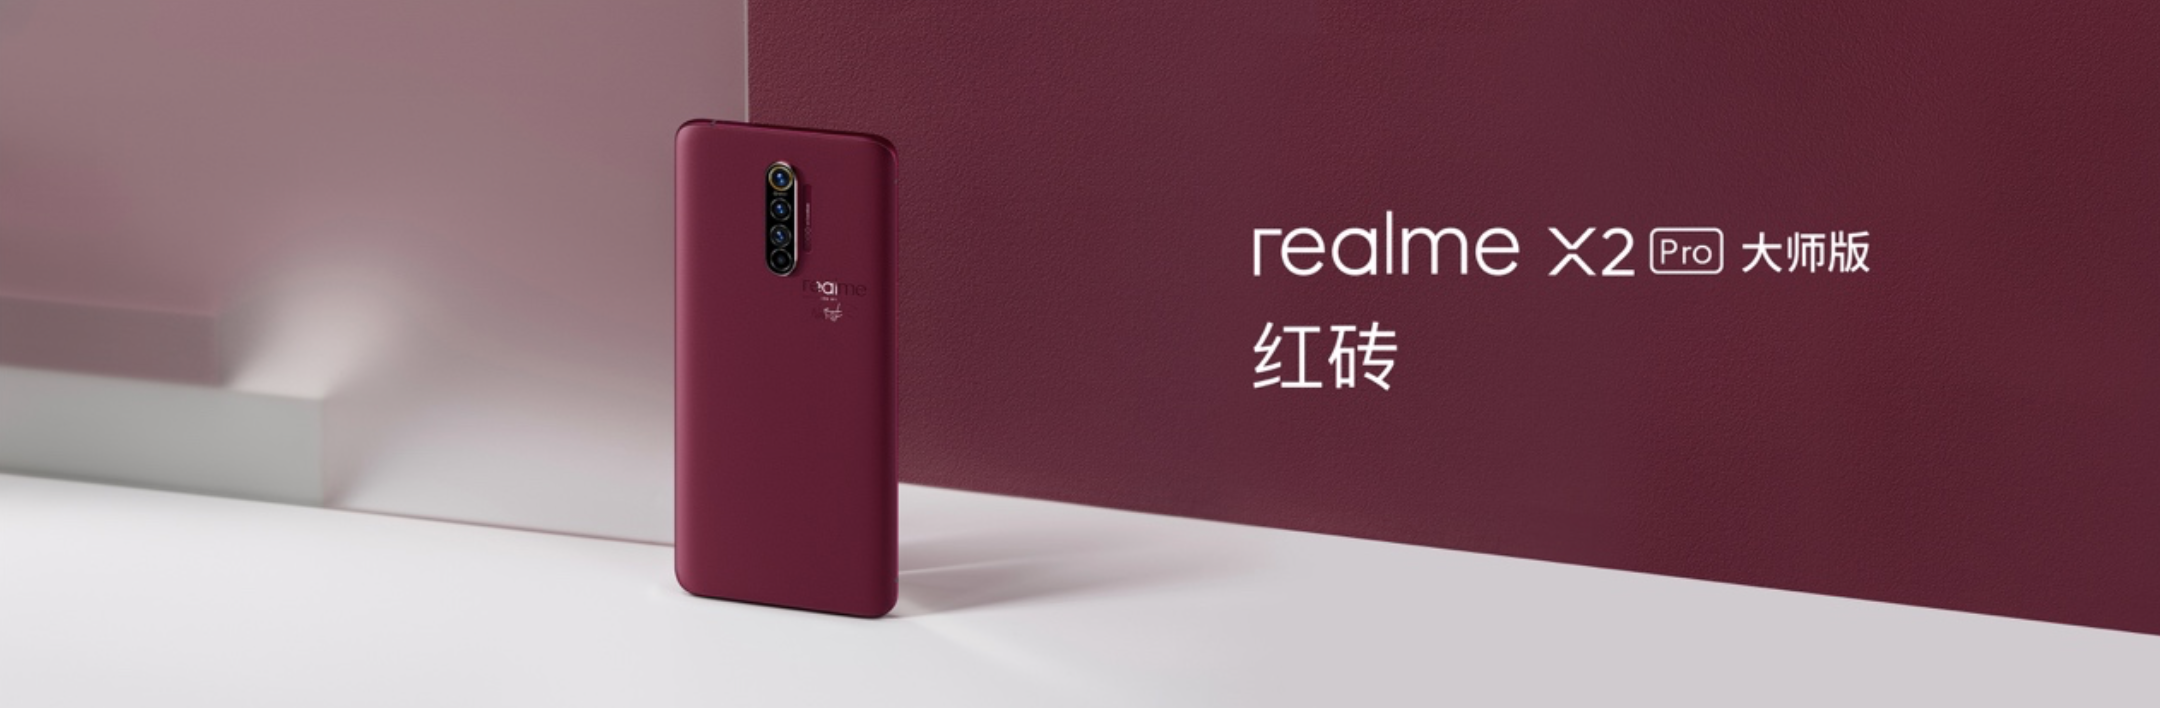 Realme出旗艦手機補齊産品矩陣 産品越級上探中高端市場